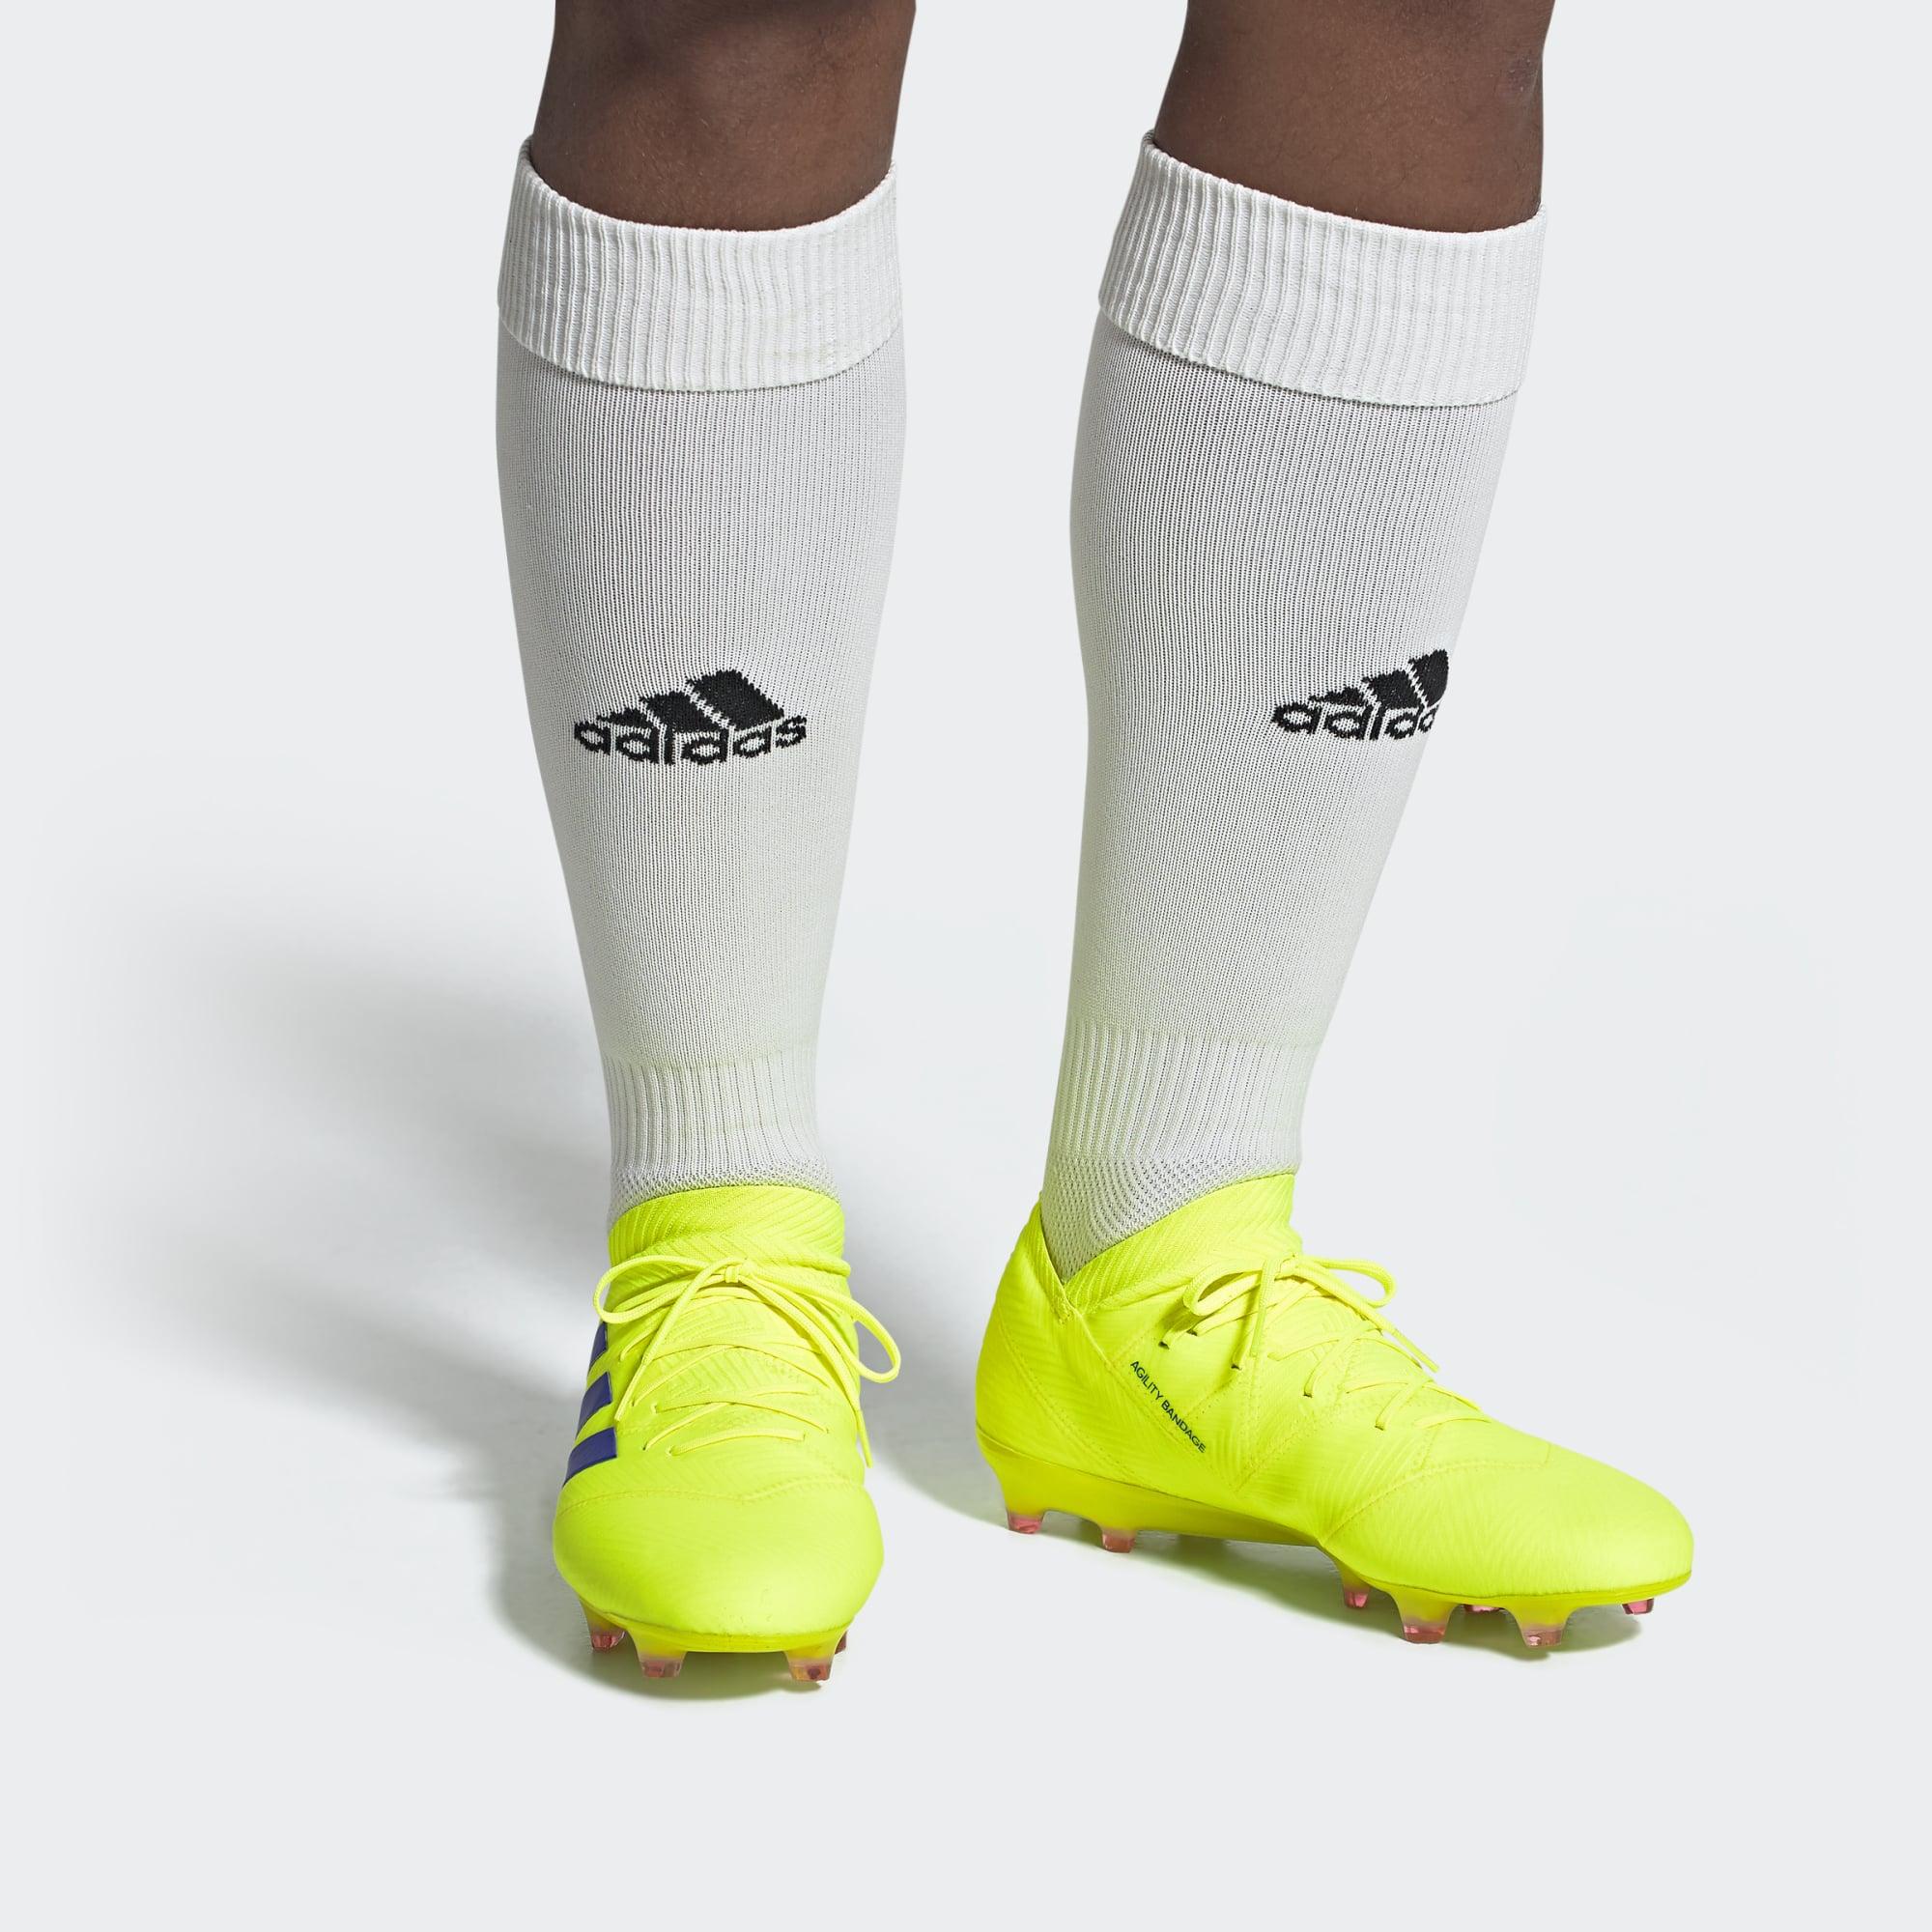 adidas nemeziz 18.1 yellow